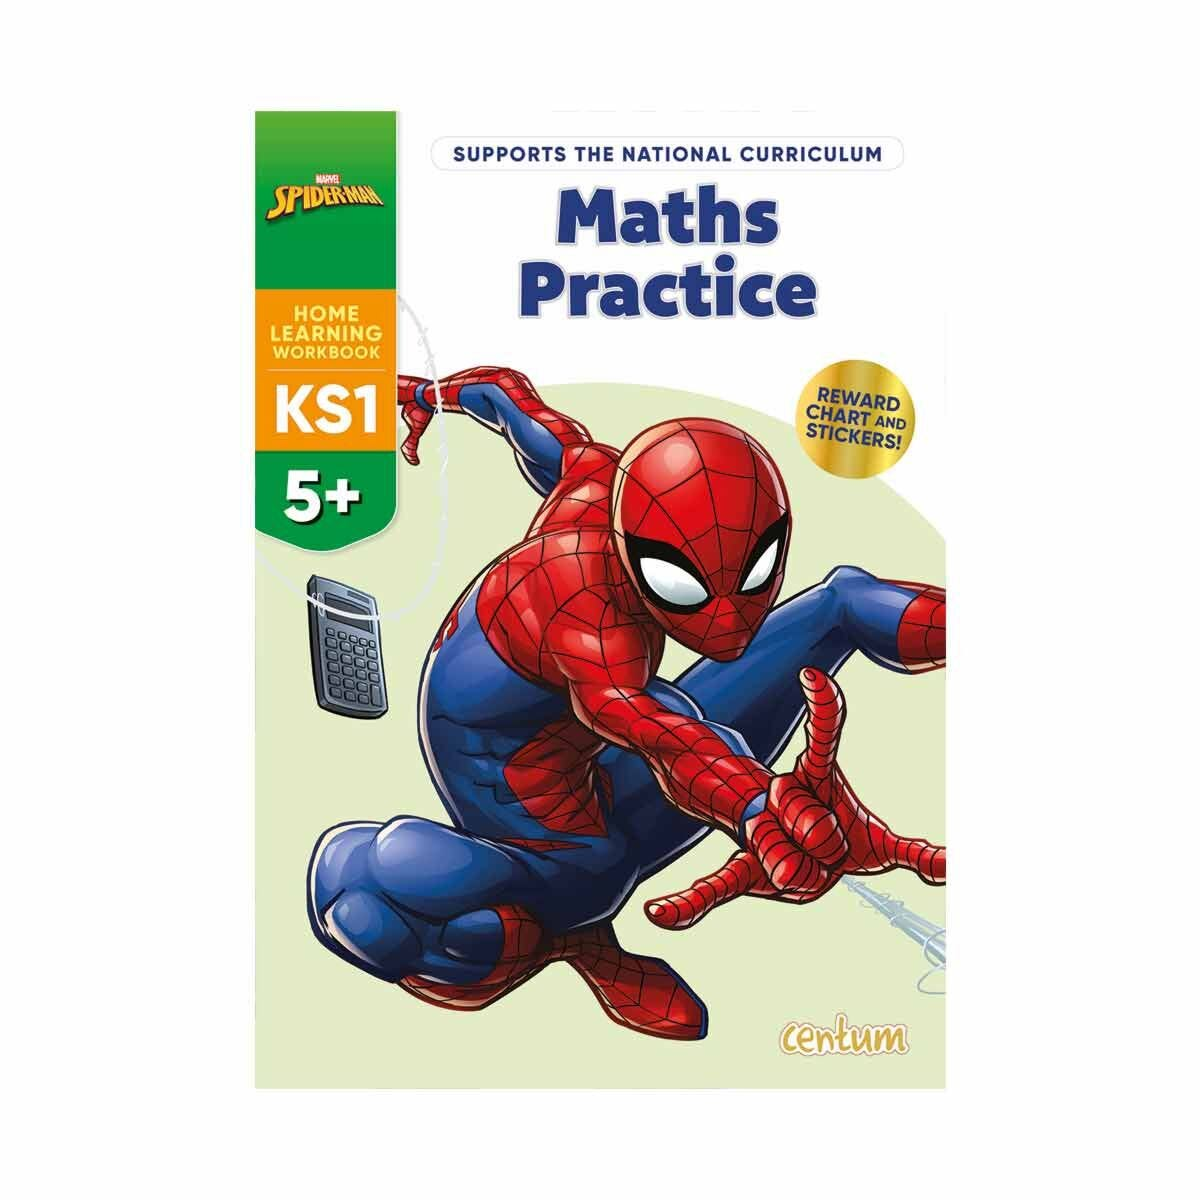 Disney Learning Spiderman Maths Practice 5